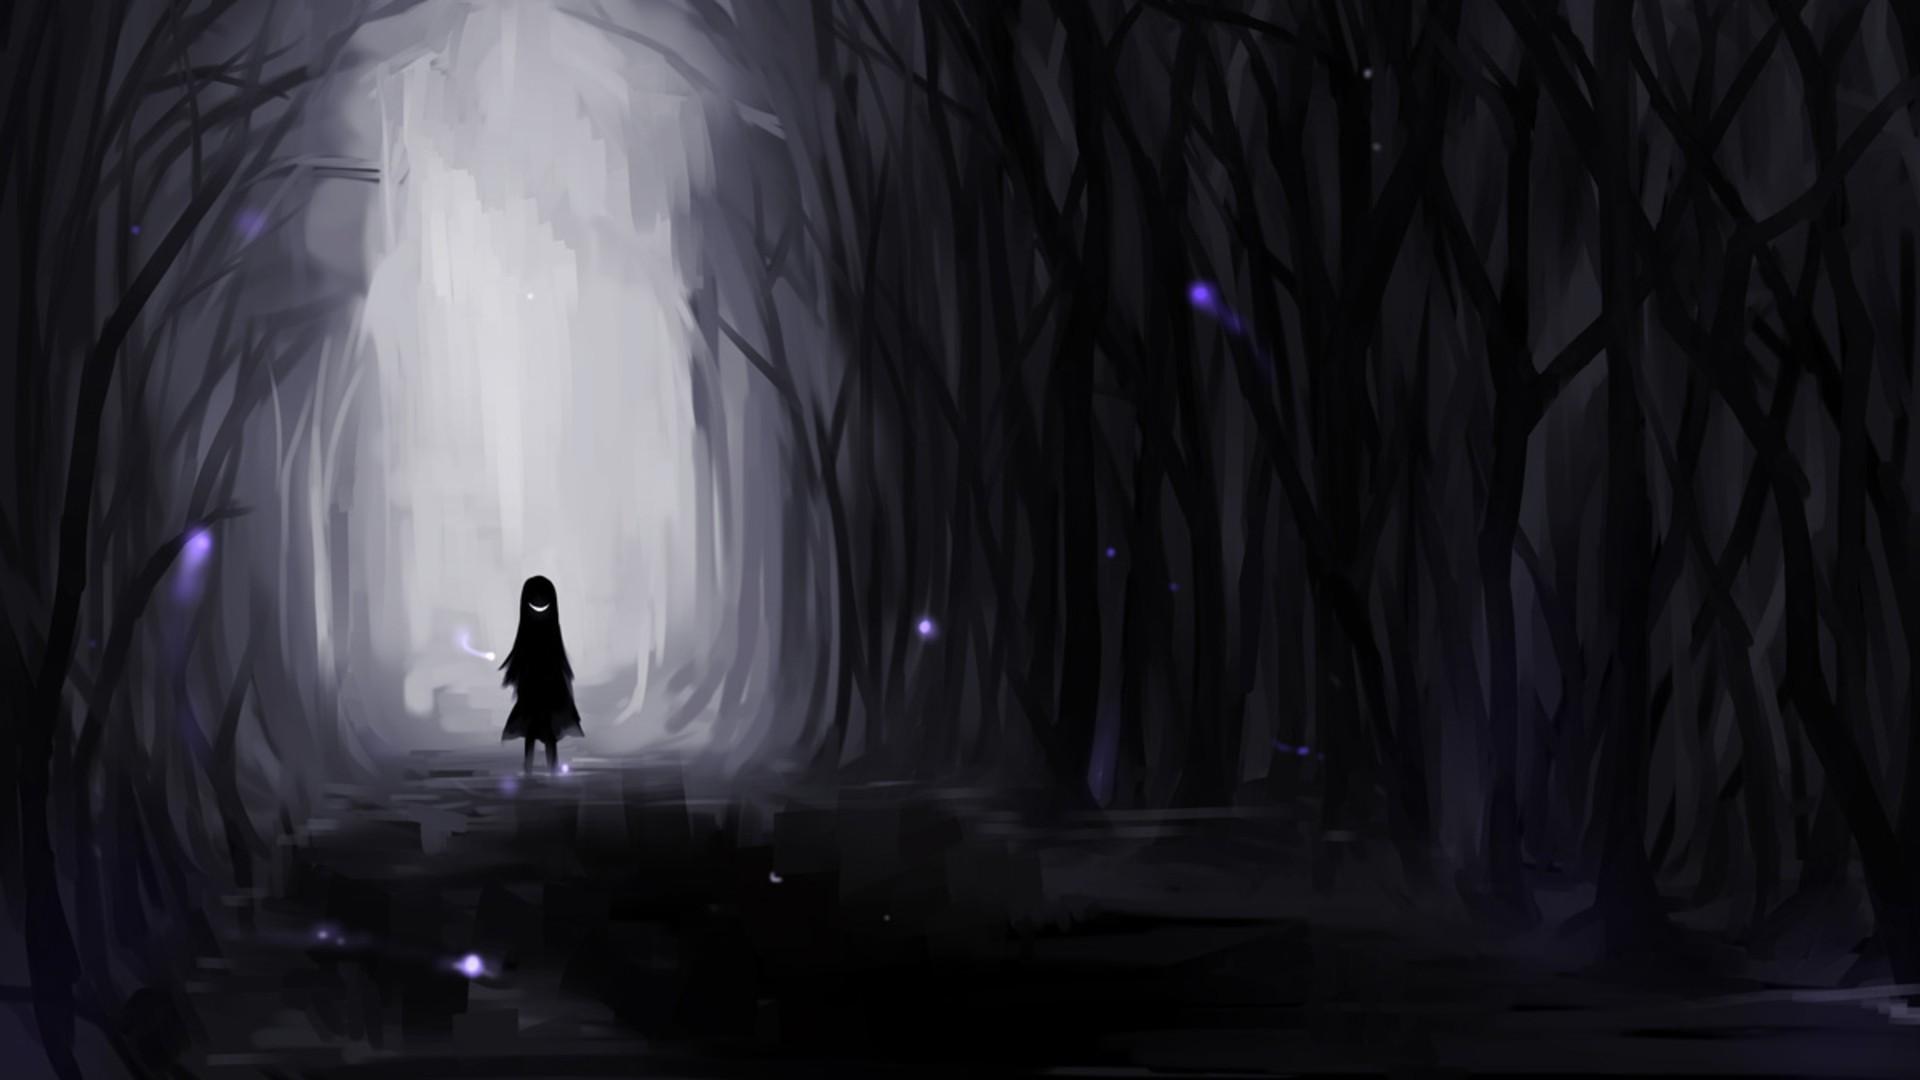 Creepy Dark Wallpaper Creepy, Dark, Forest, Evil, Smiles .